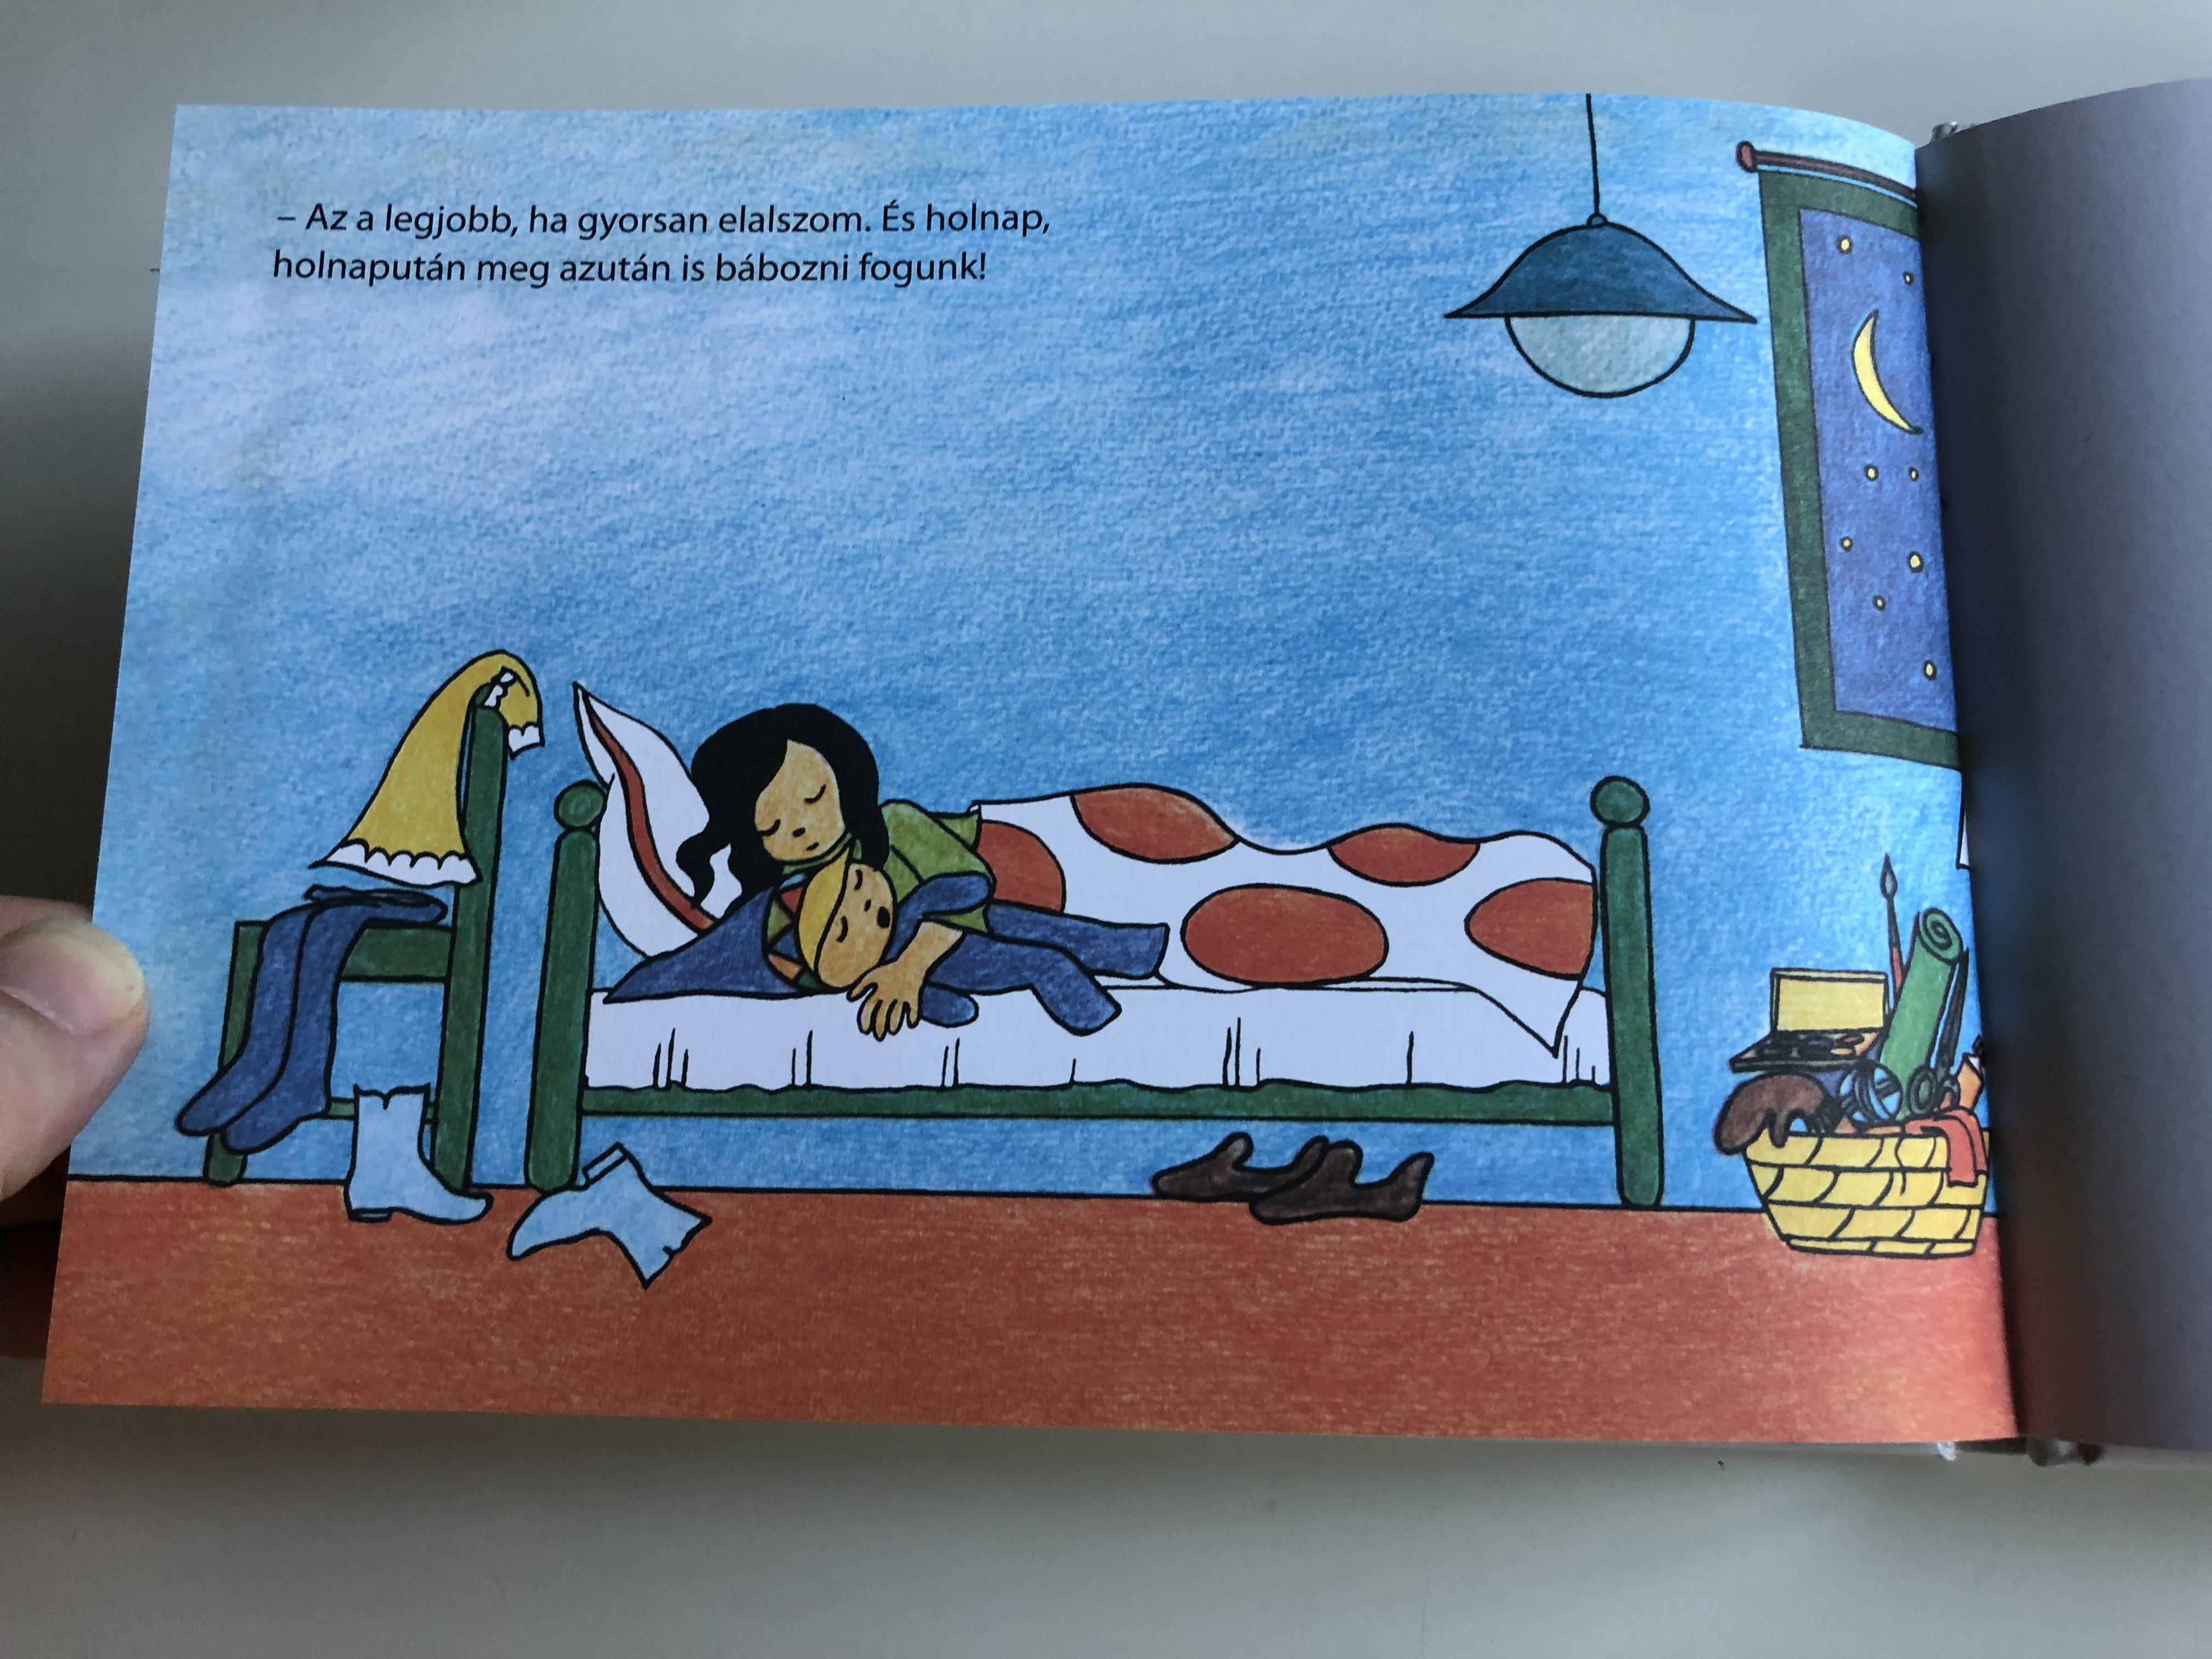 tegnap-ma-holnap-by-mar-k-veronika-felelget-s-k-nyv-hungarian-language-children-s-book-about-weekdays-m-ra-k-nyvkiad-2011-11-.jpg